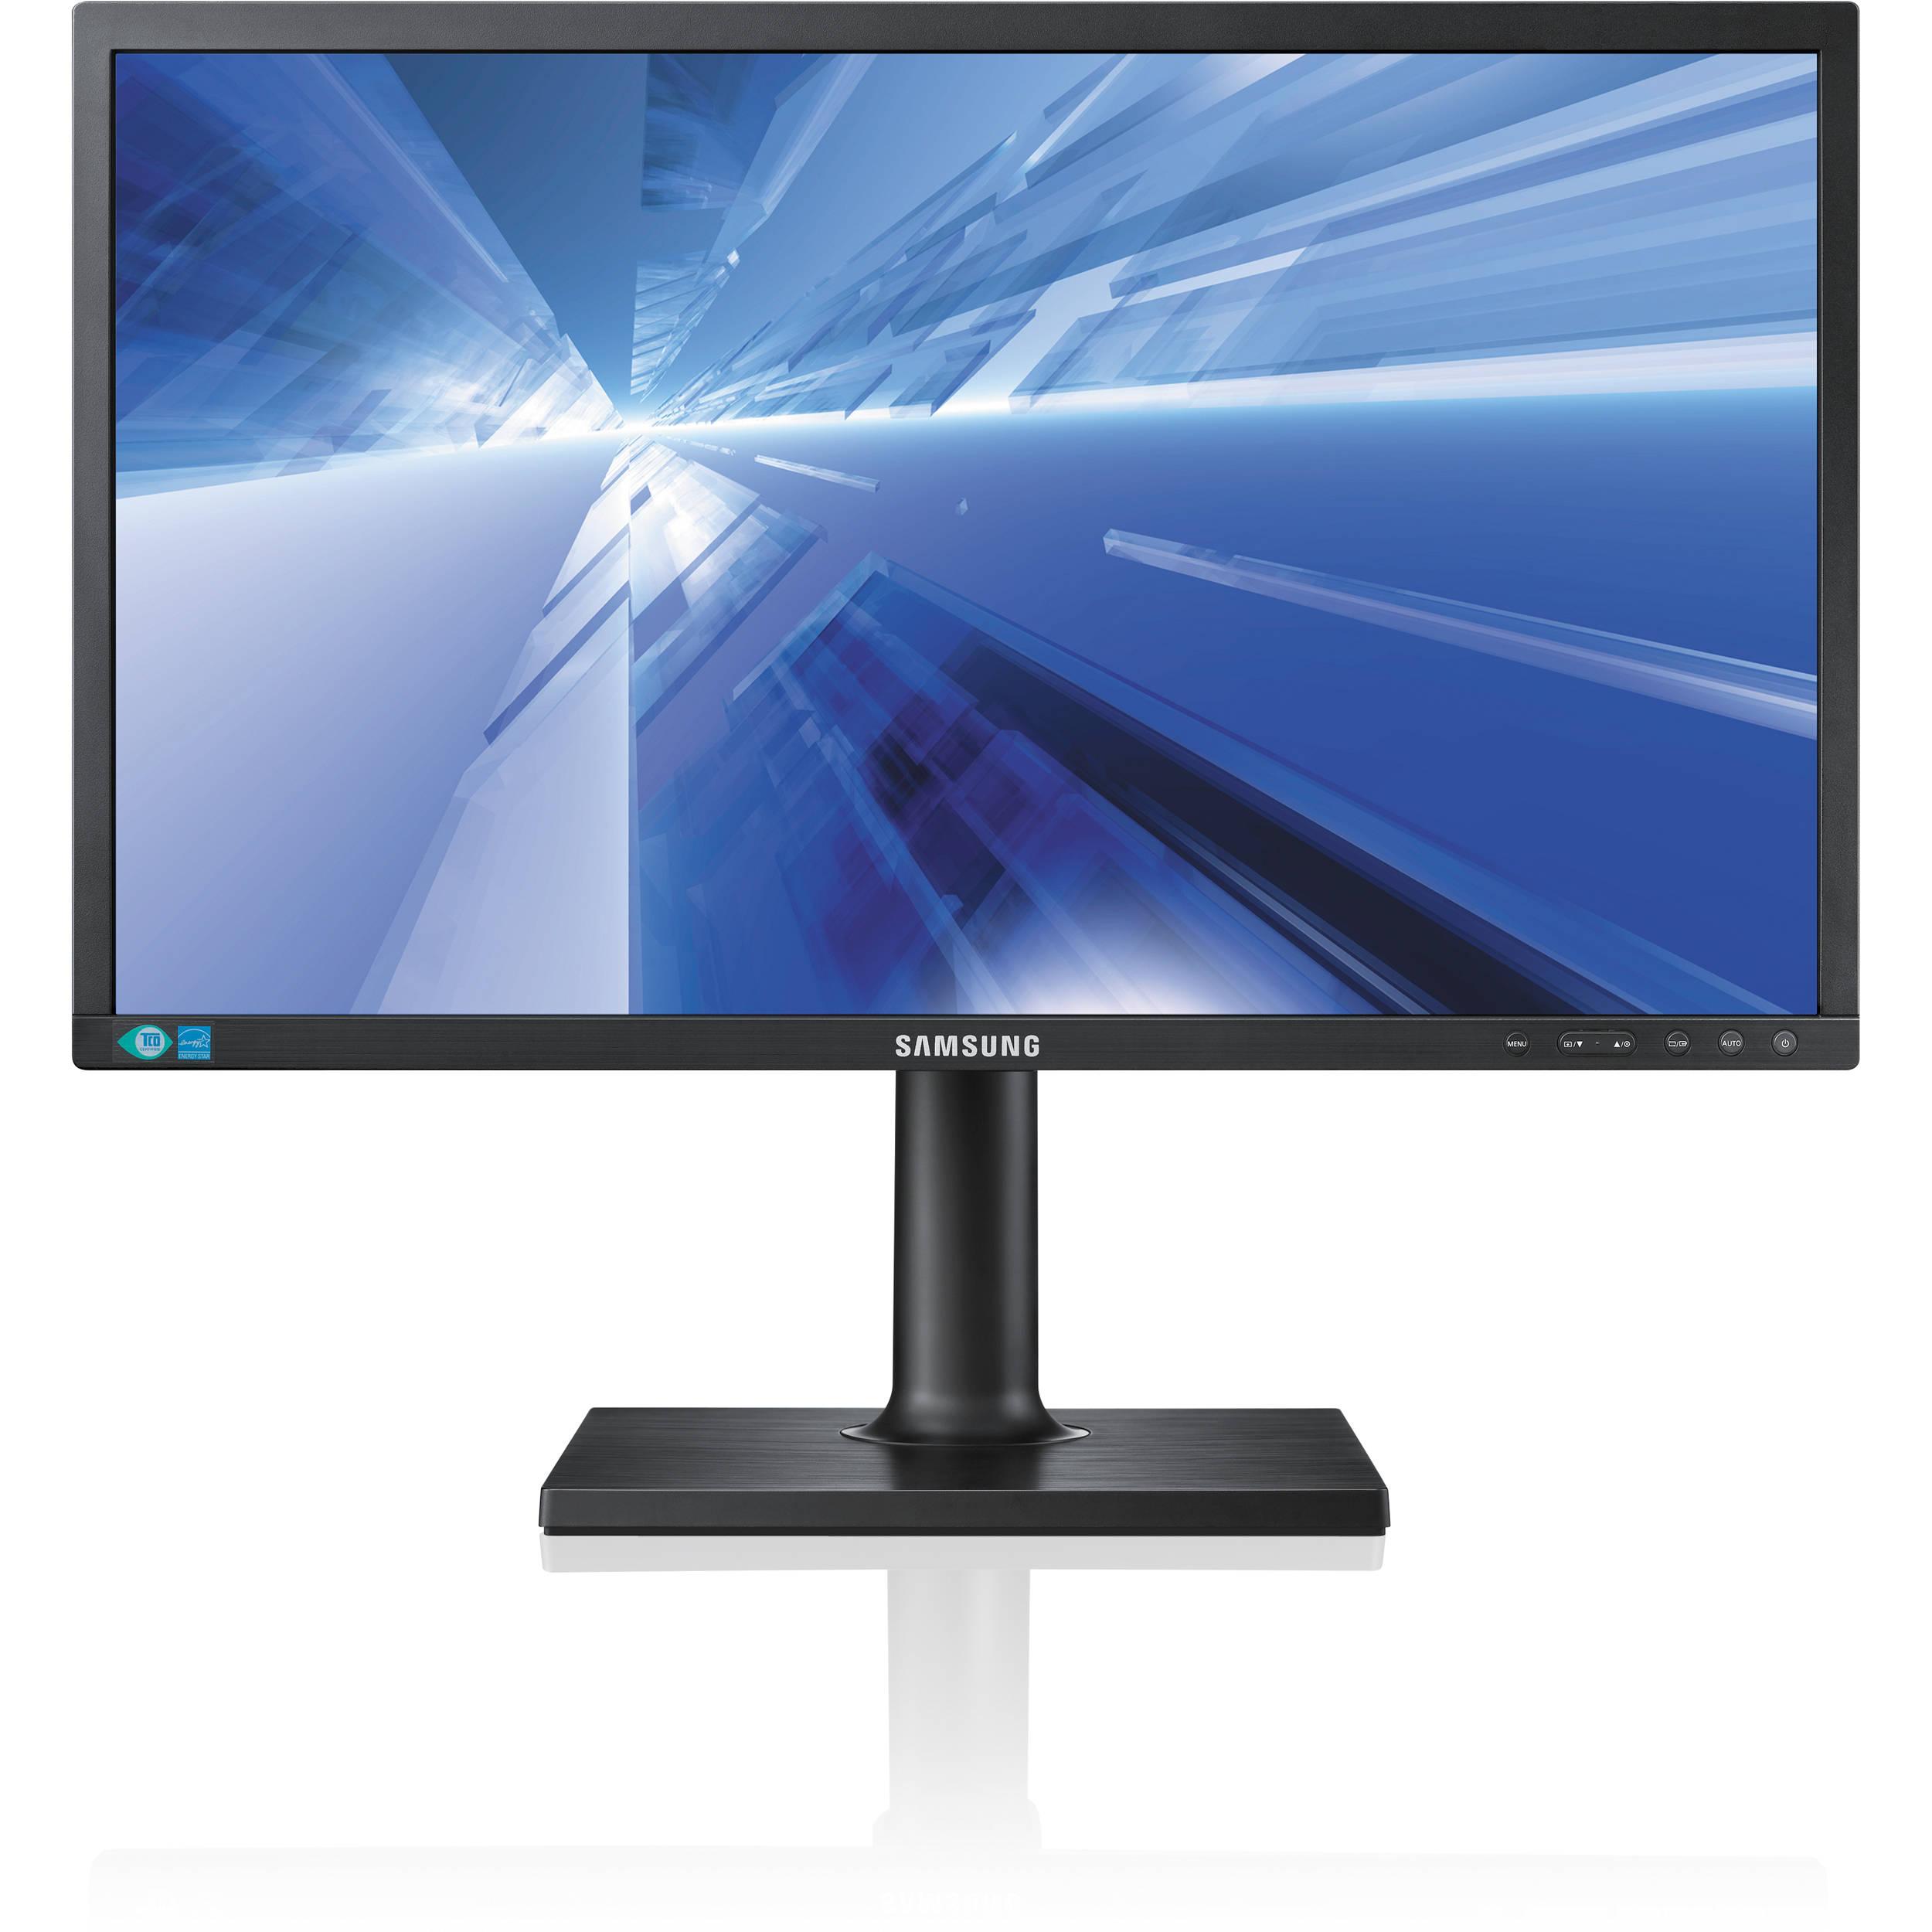 samsung s27c450d 27 led backlit lcd monitor s27c450d b h rh bhphotovideo com Samsung Rear TV Series 350 Samsung Rear TV Series 350